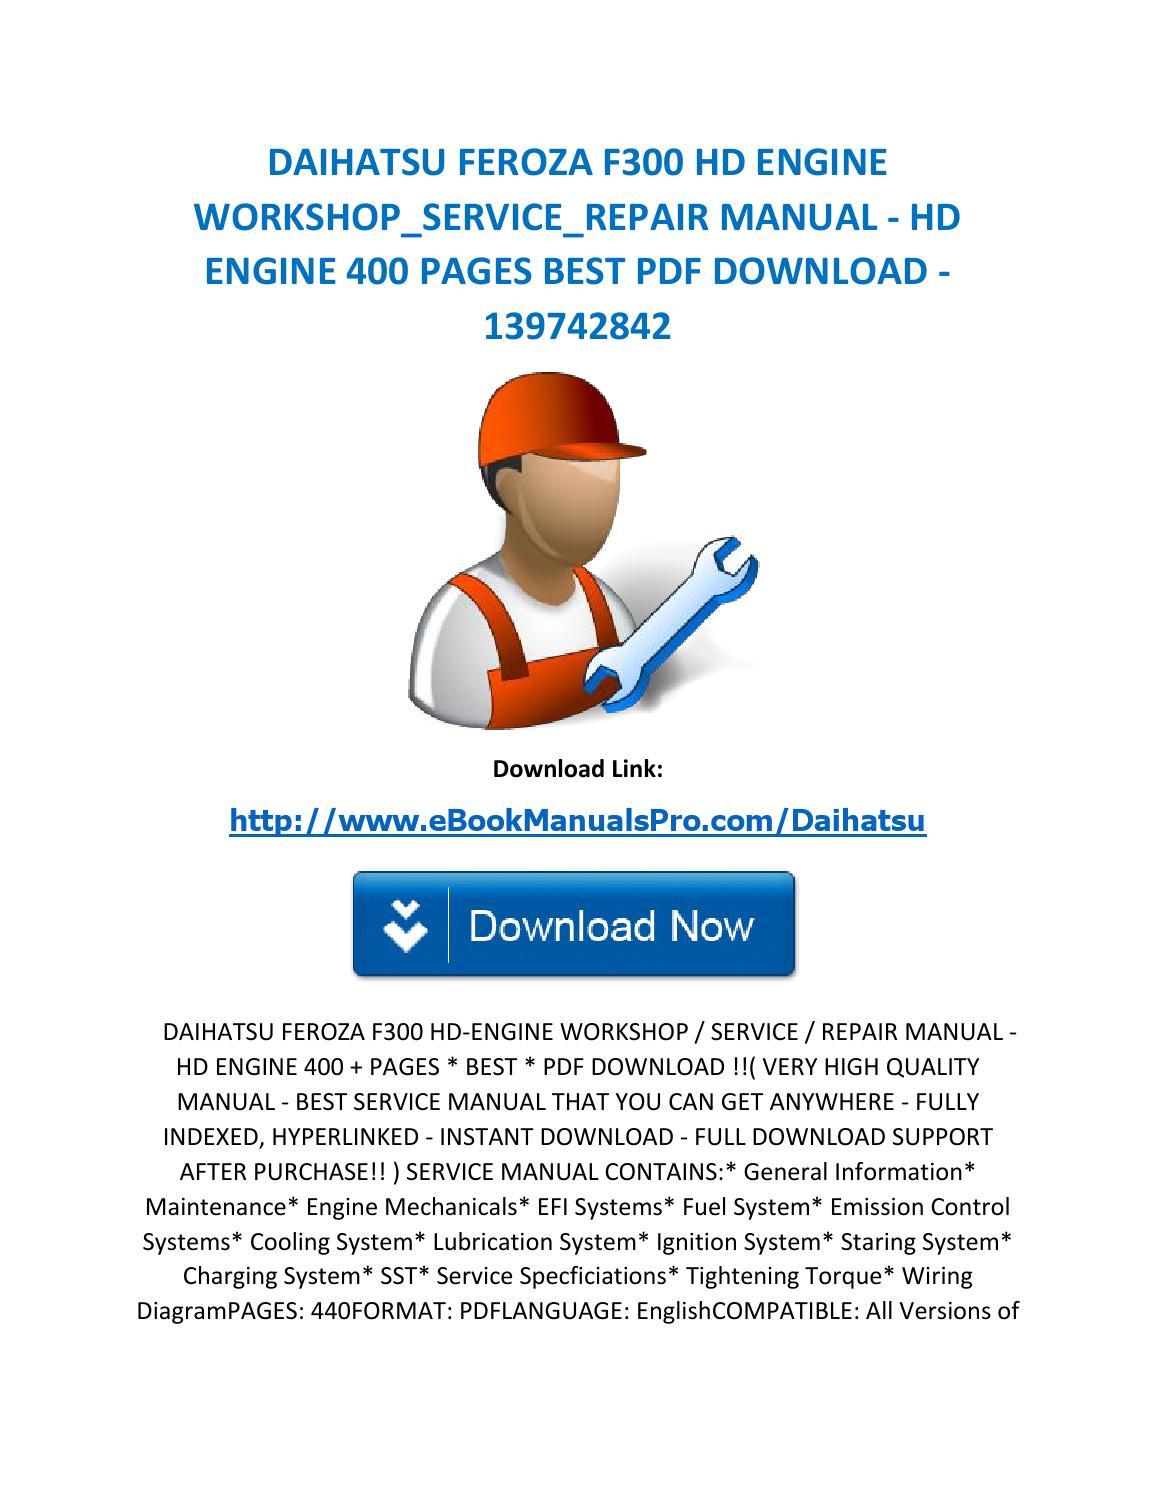 Daihatsu feroza f300 hd engine workshop service repair manual hd engine 400  pages best pdf download by karl casino - issuu